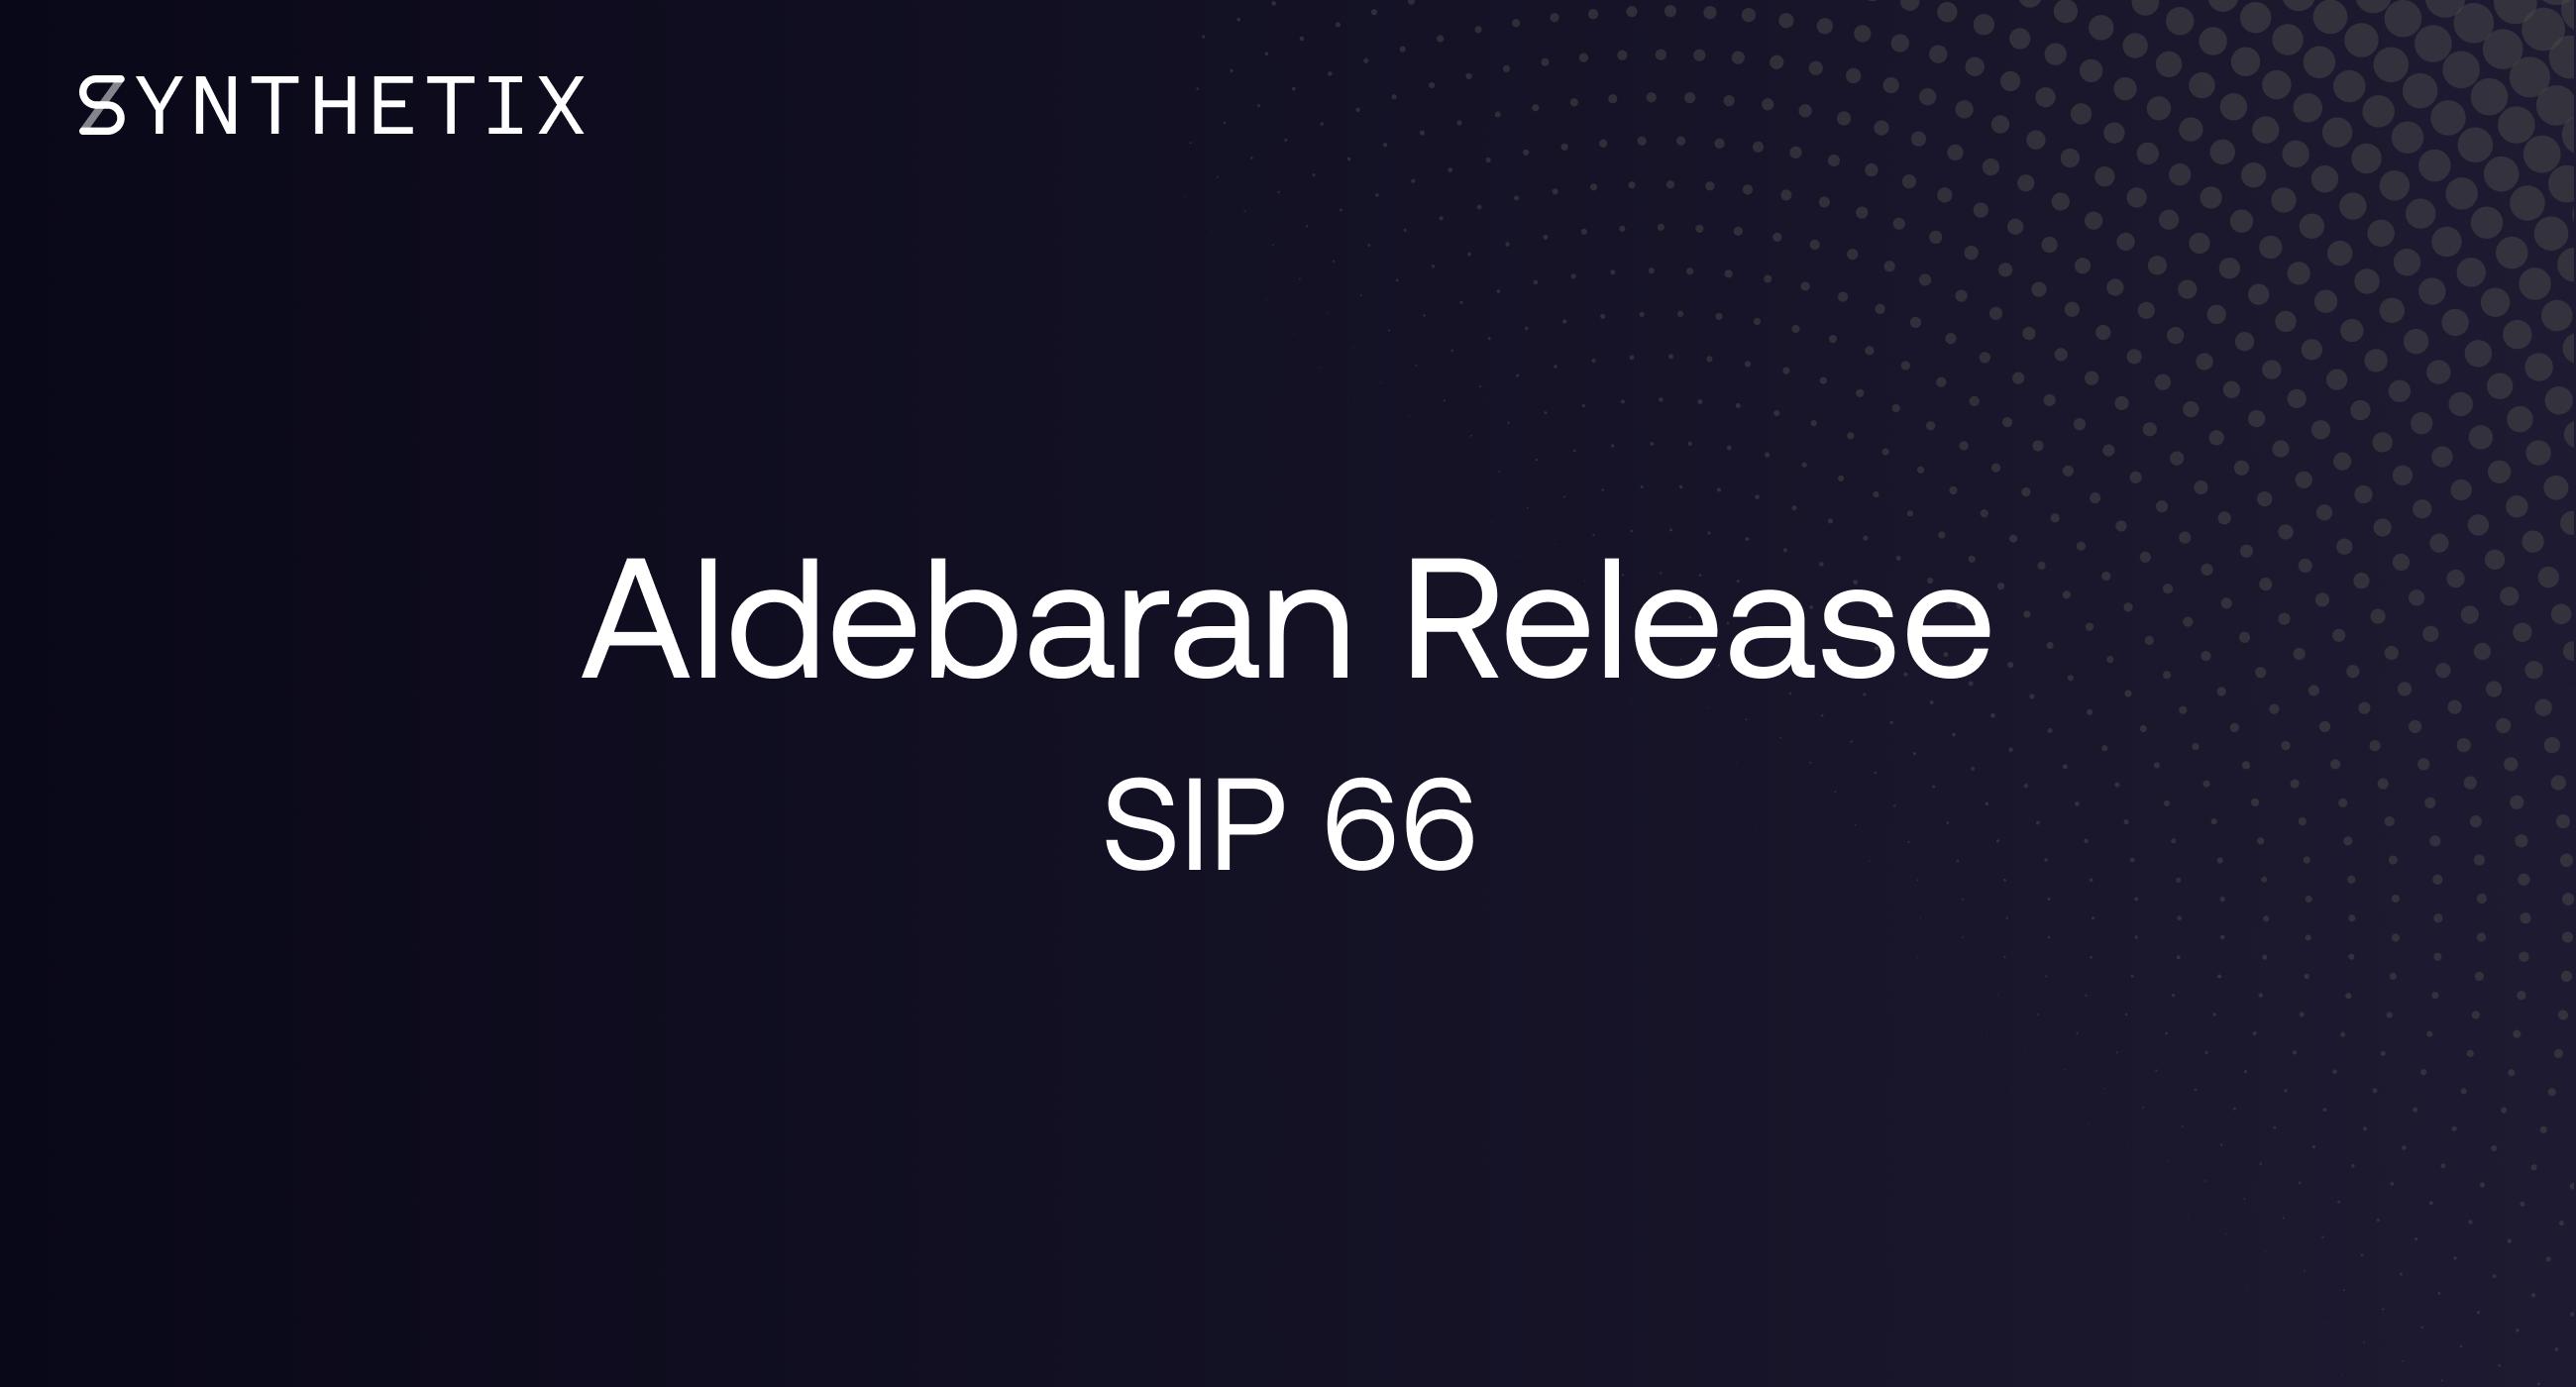 The Aldebaran release